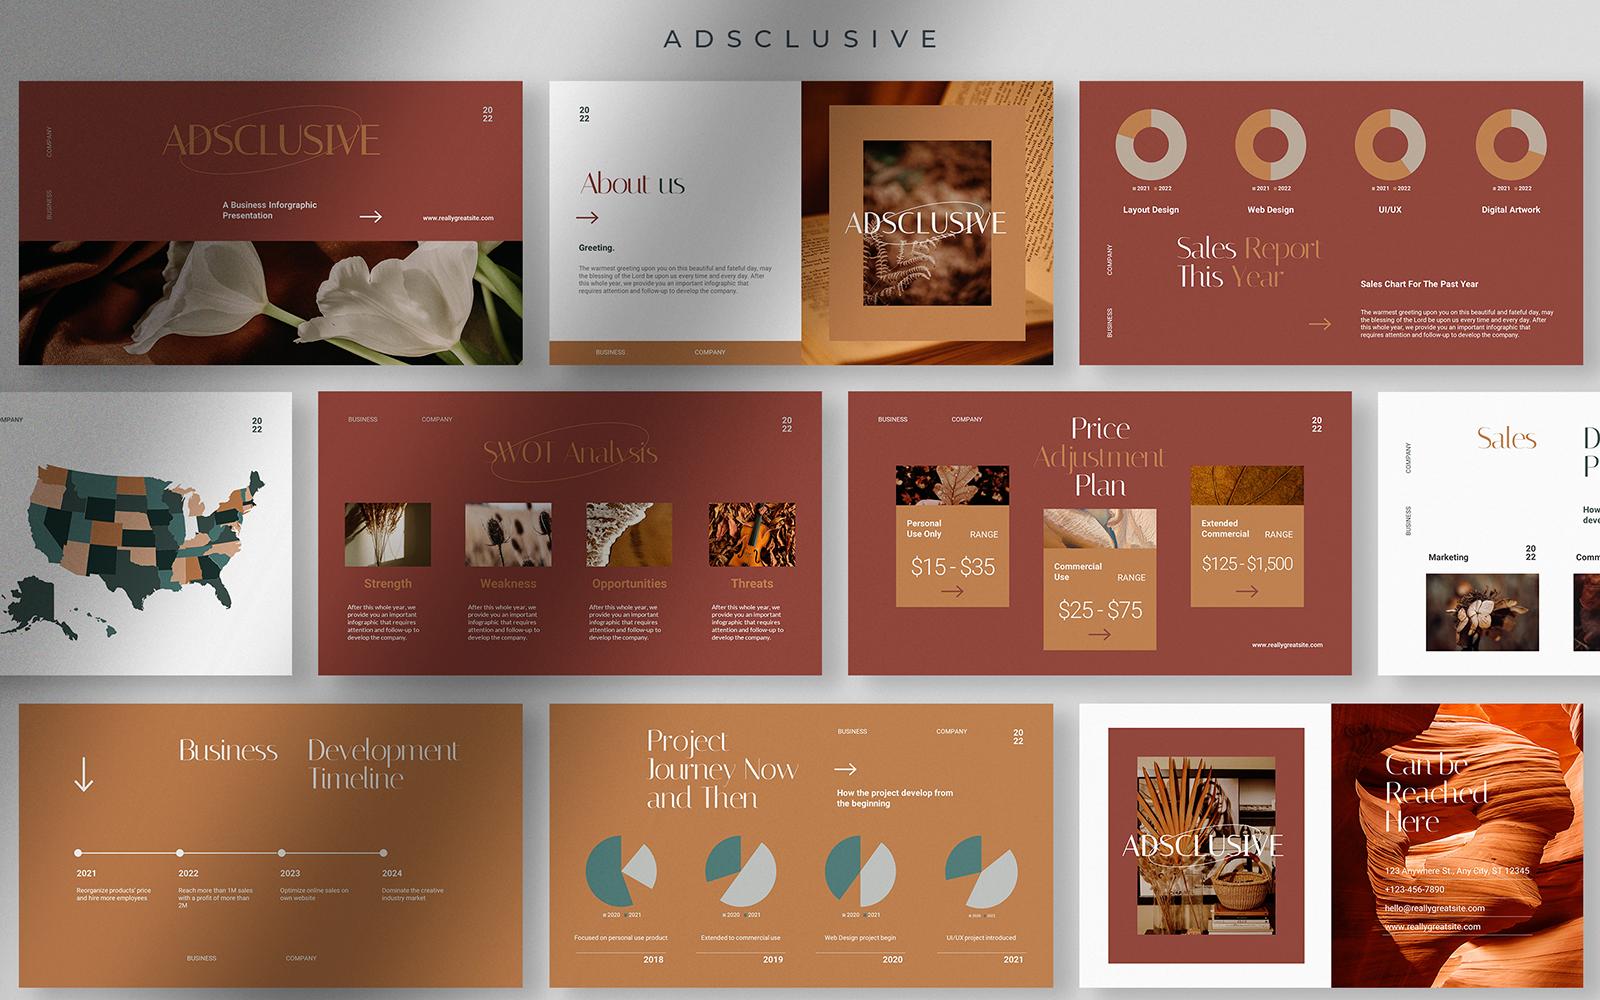 Adsclusive - Business Infographic Presentation